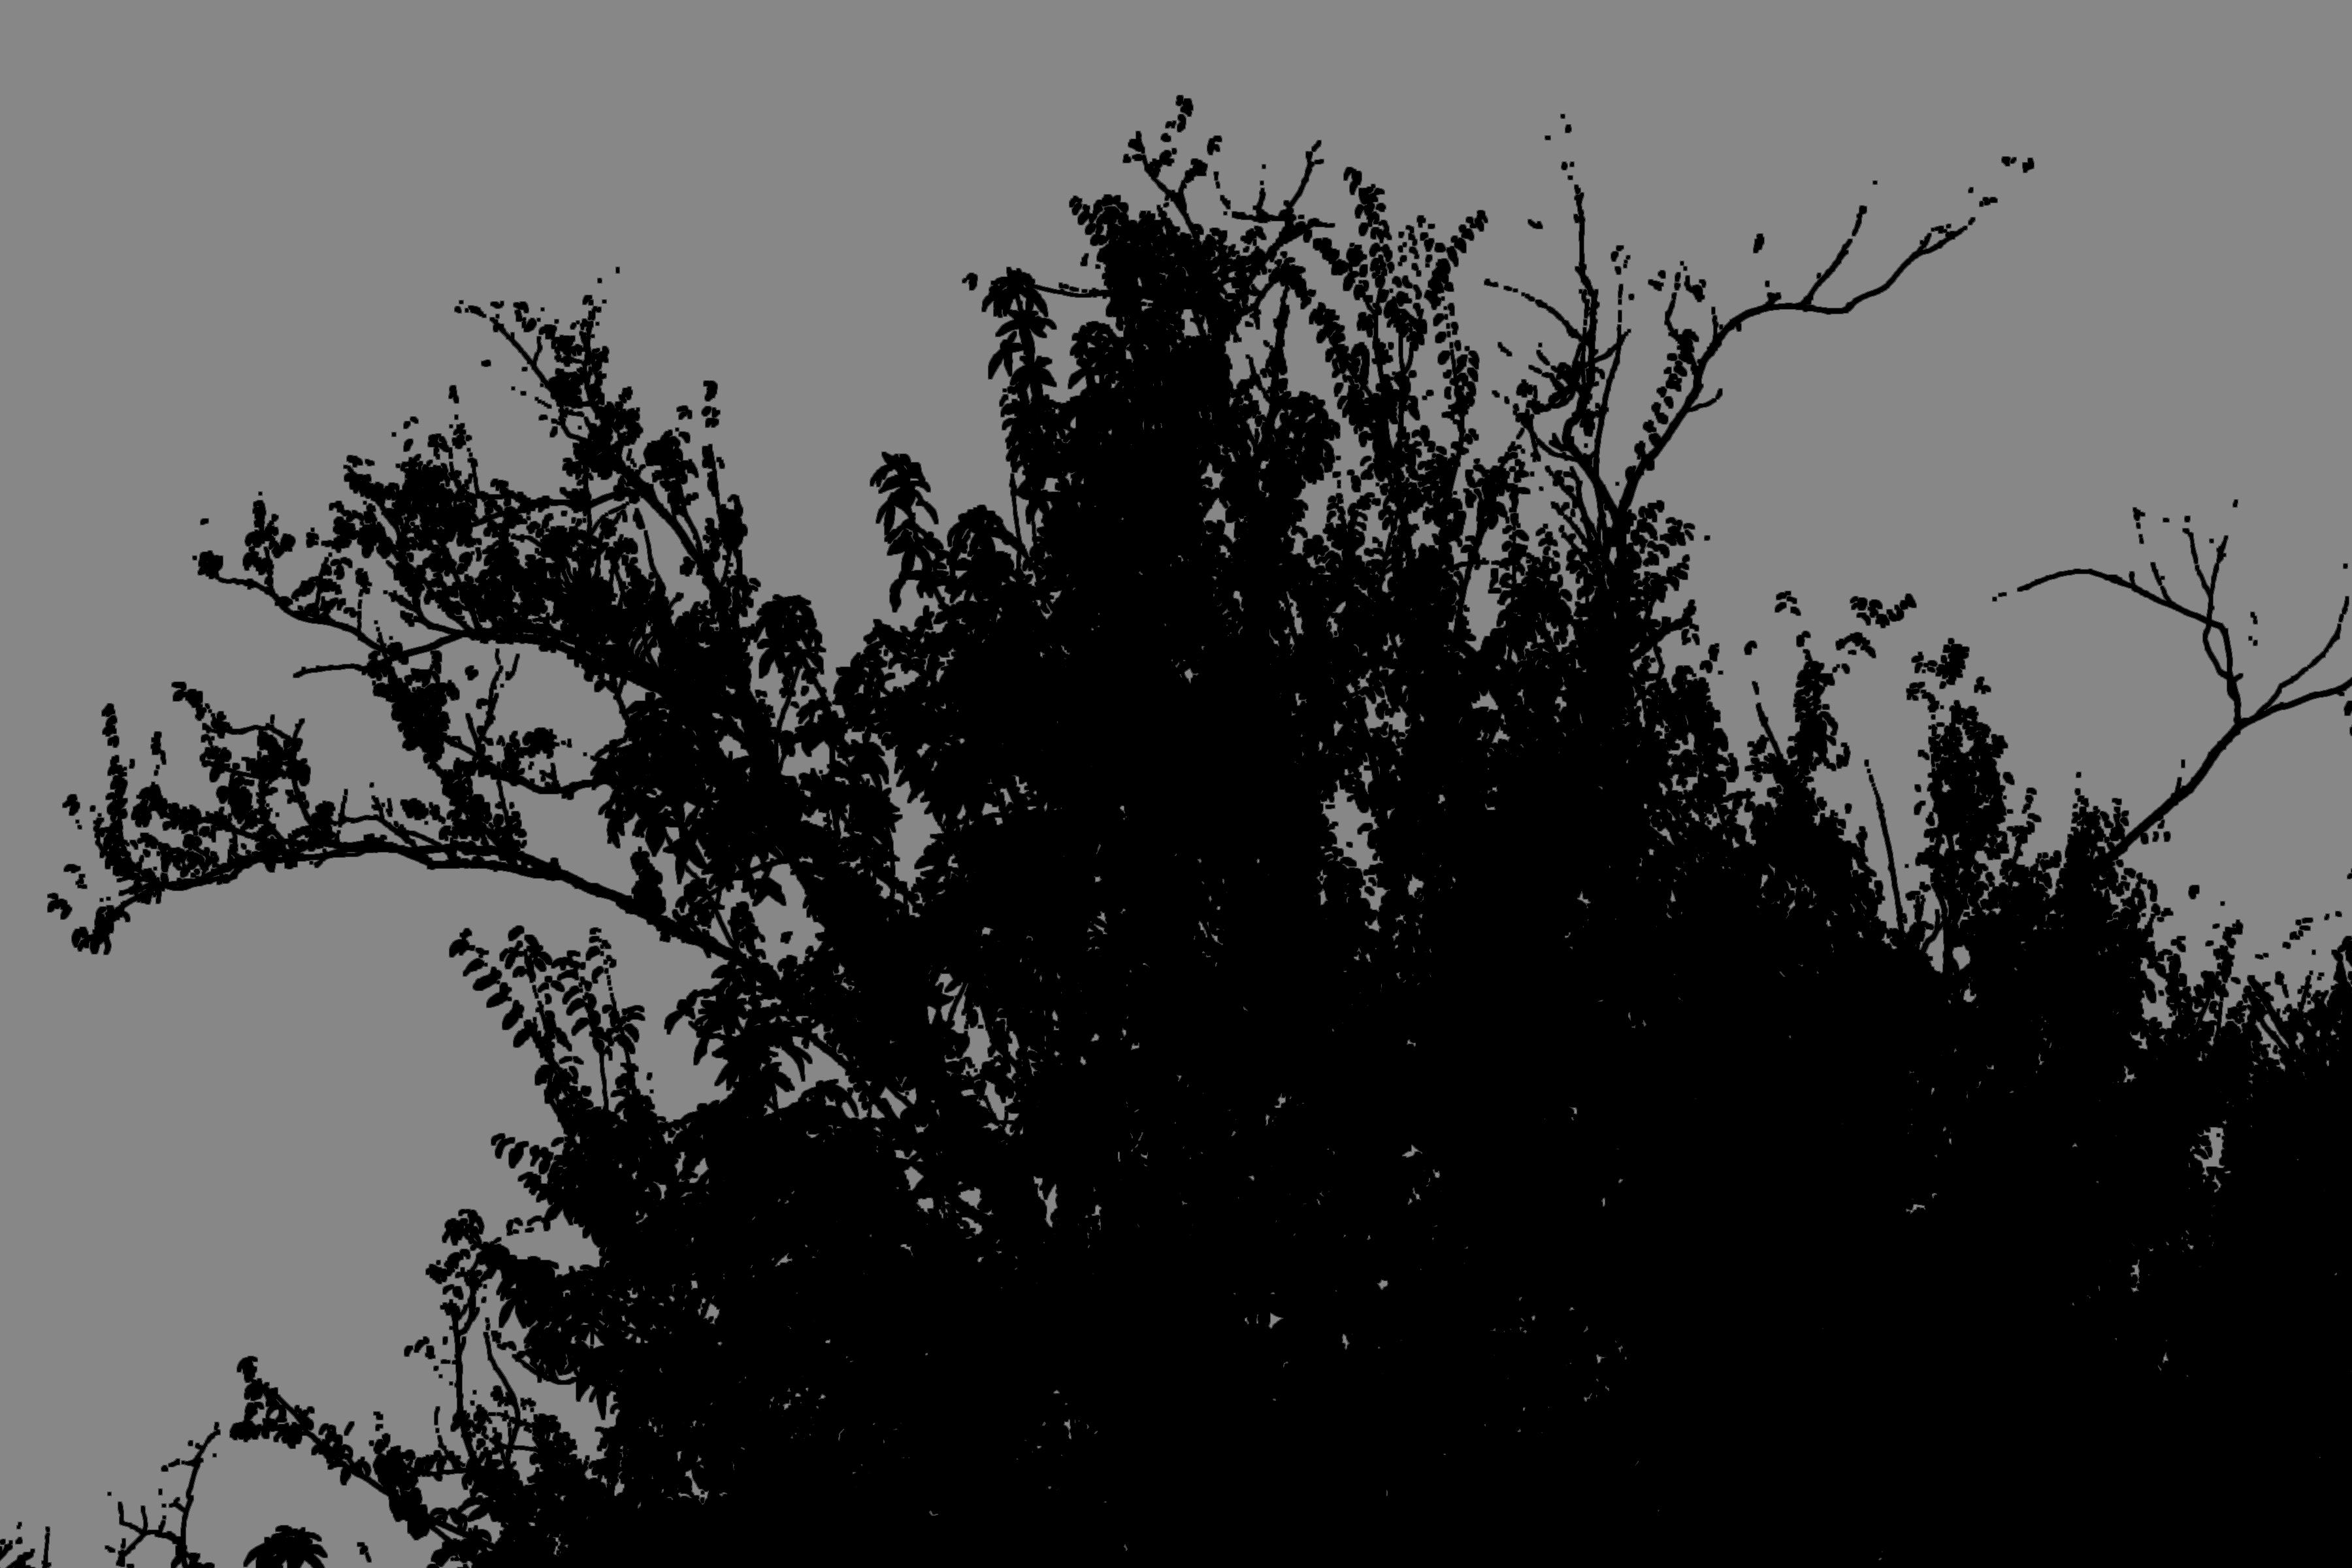 Bush Silhouette Arvore Desenho Desenho Arvores